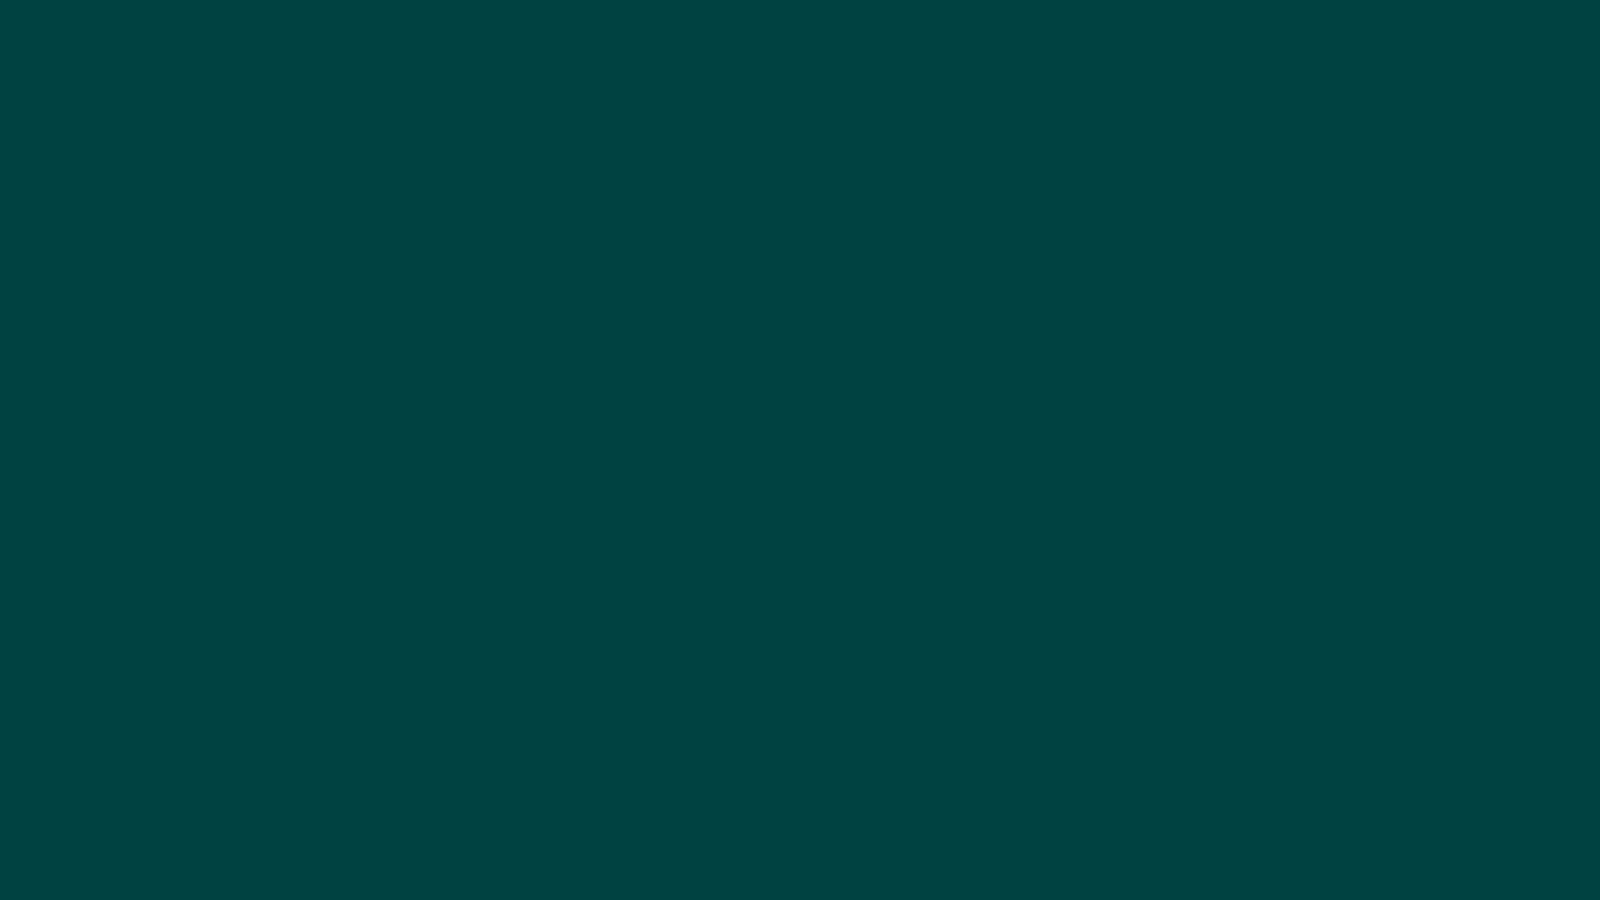 1600x900 Warm Black Solid Color Background